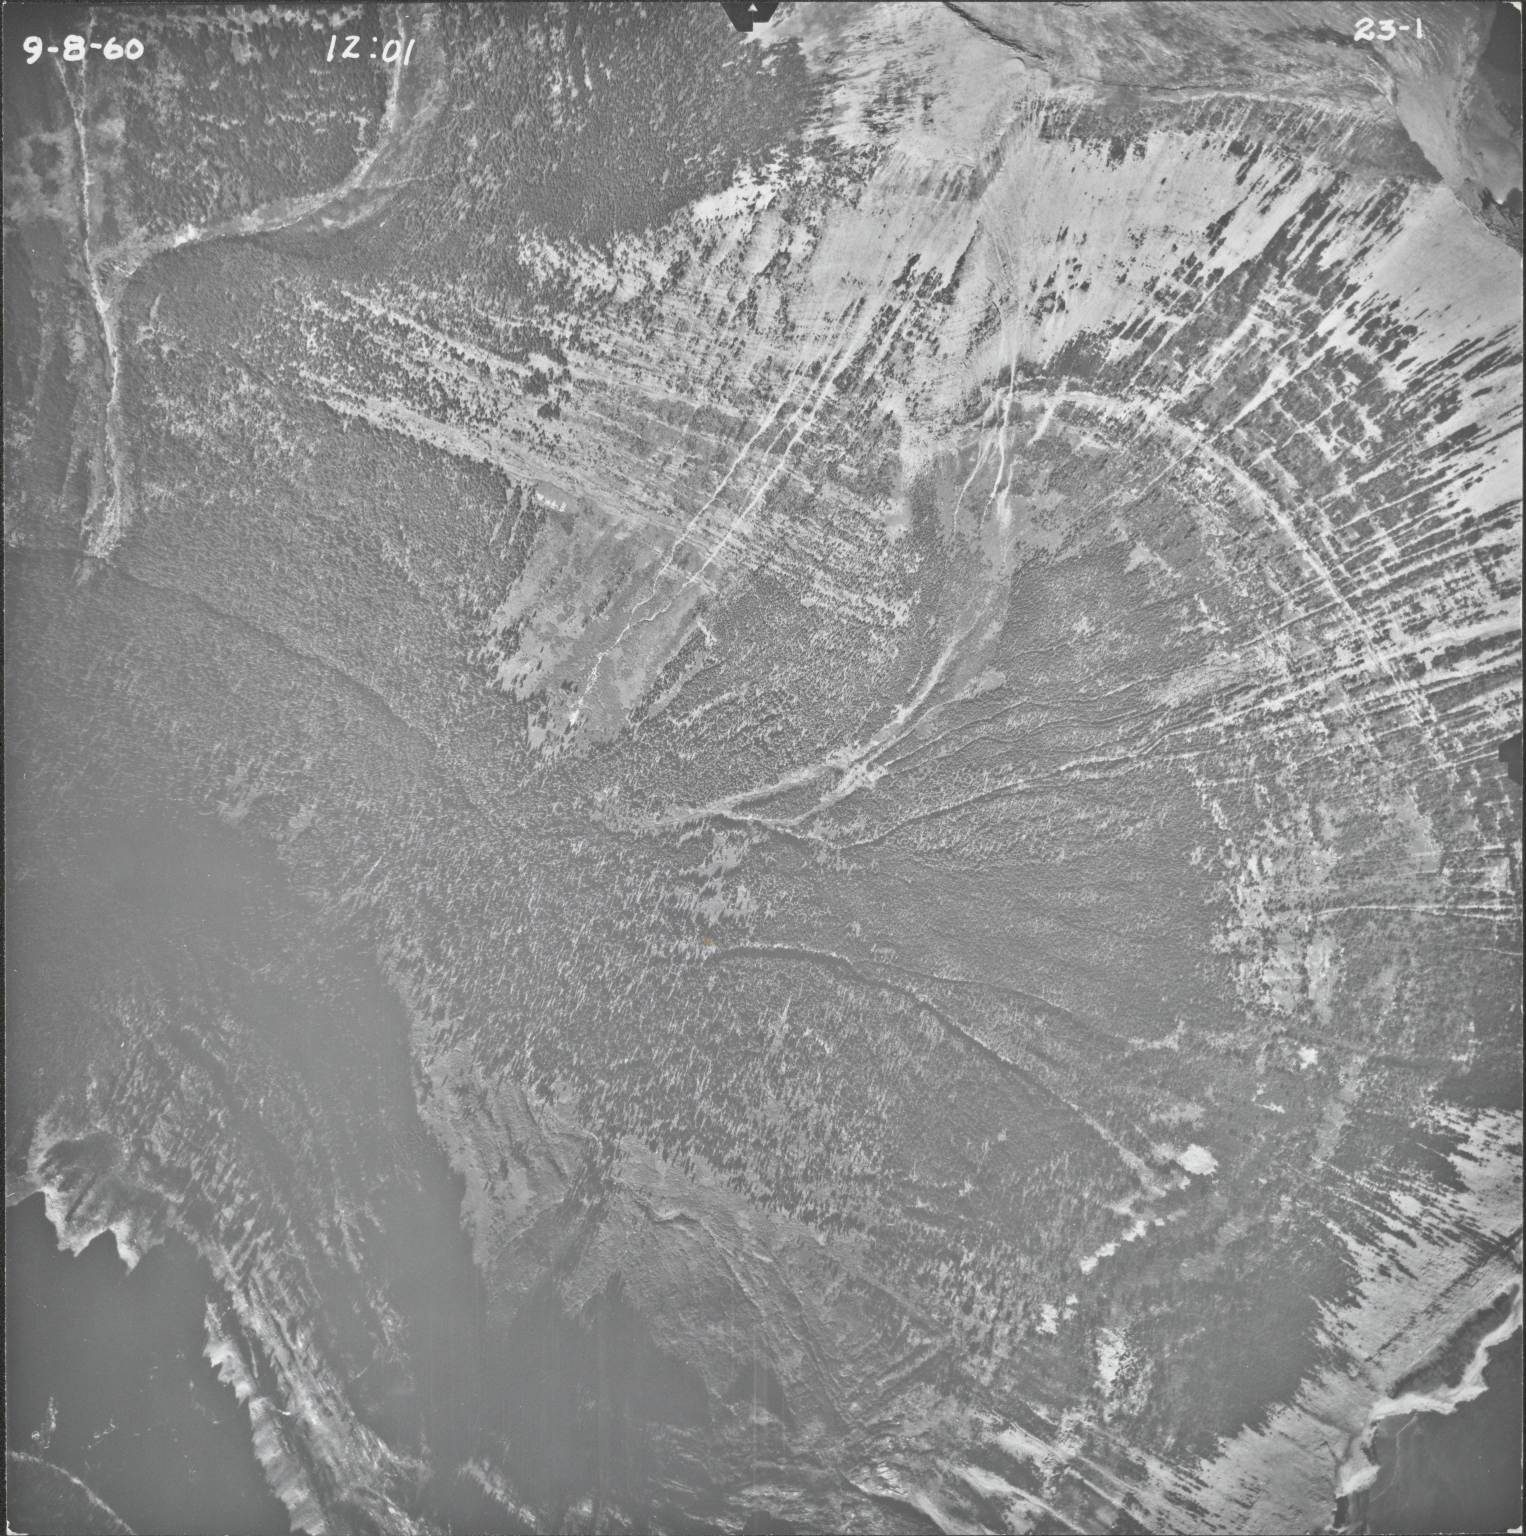 Razoredge Mountain and Tinkham Mountain, aerial photograph 23-1, Montana